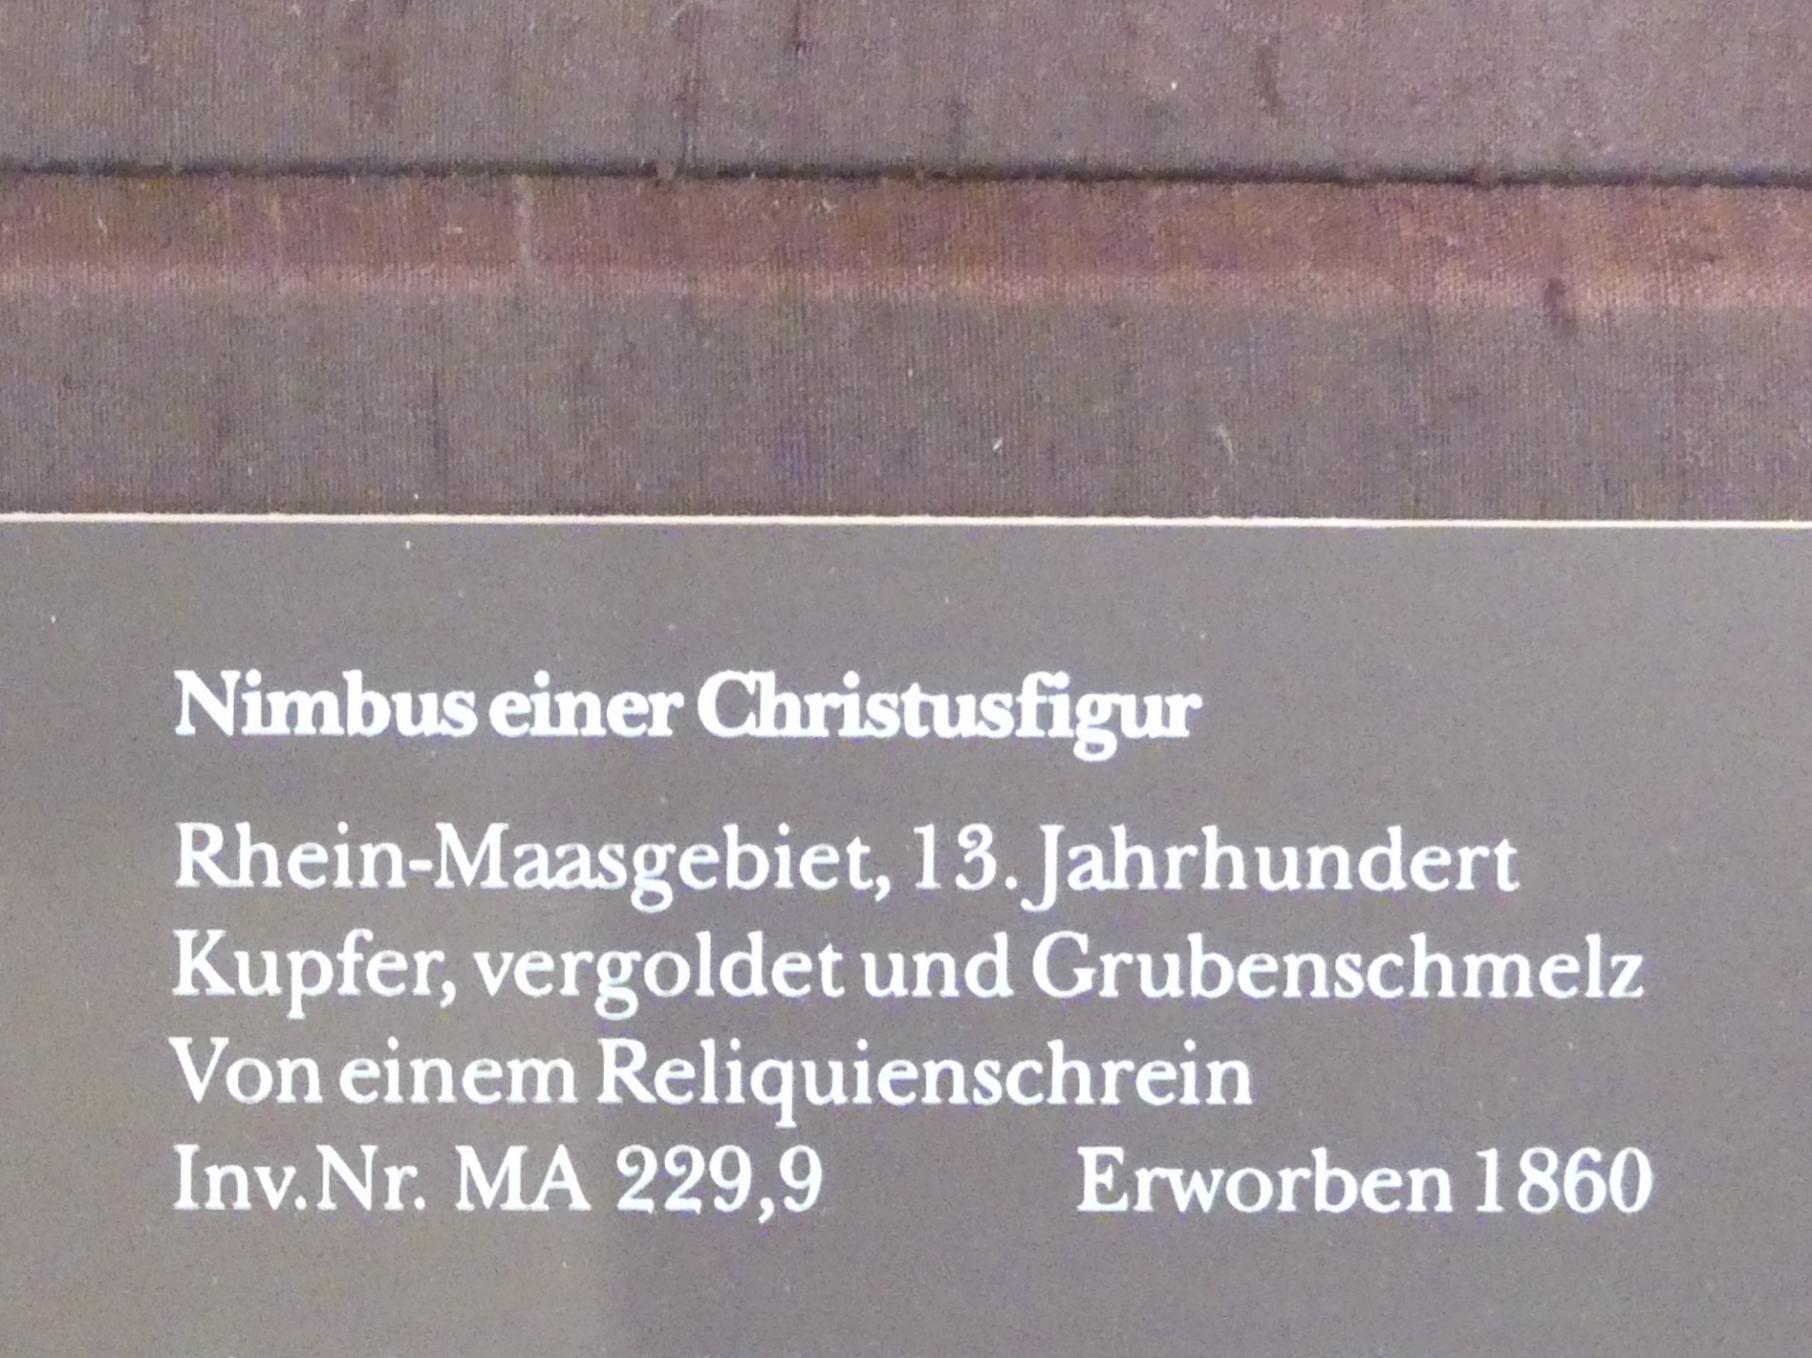 Nimbus einer Christusfigur, 13. Jhd., Bild 2/2